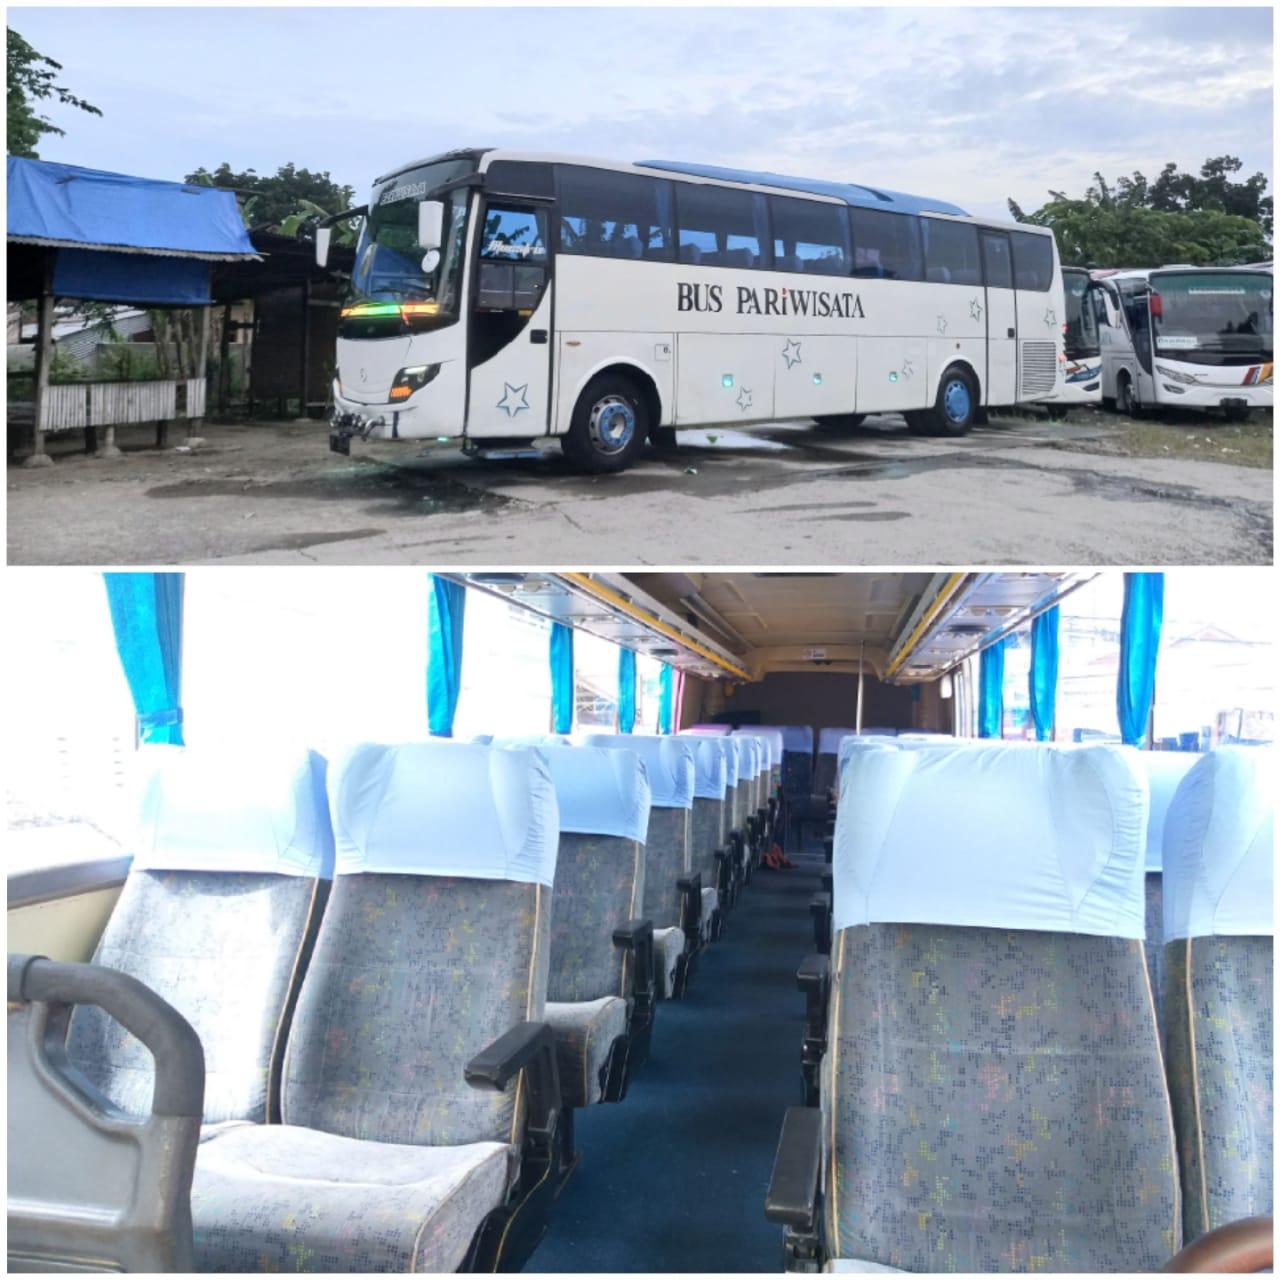 Big Bus Pariwisata Medan 45 Seats